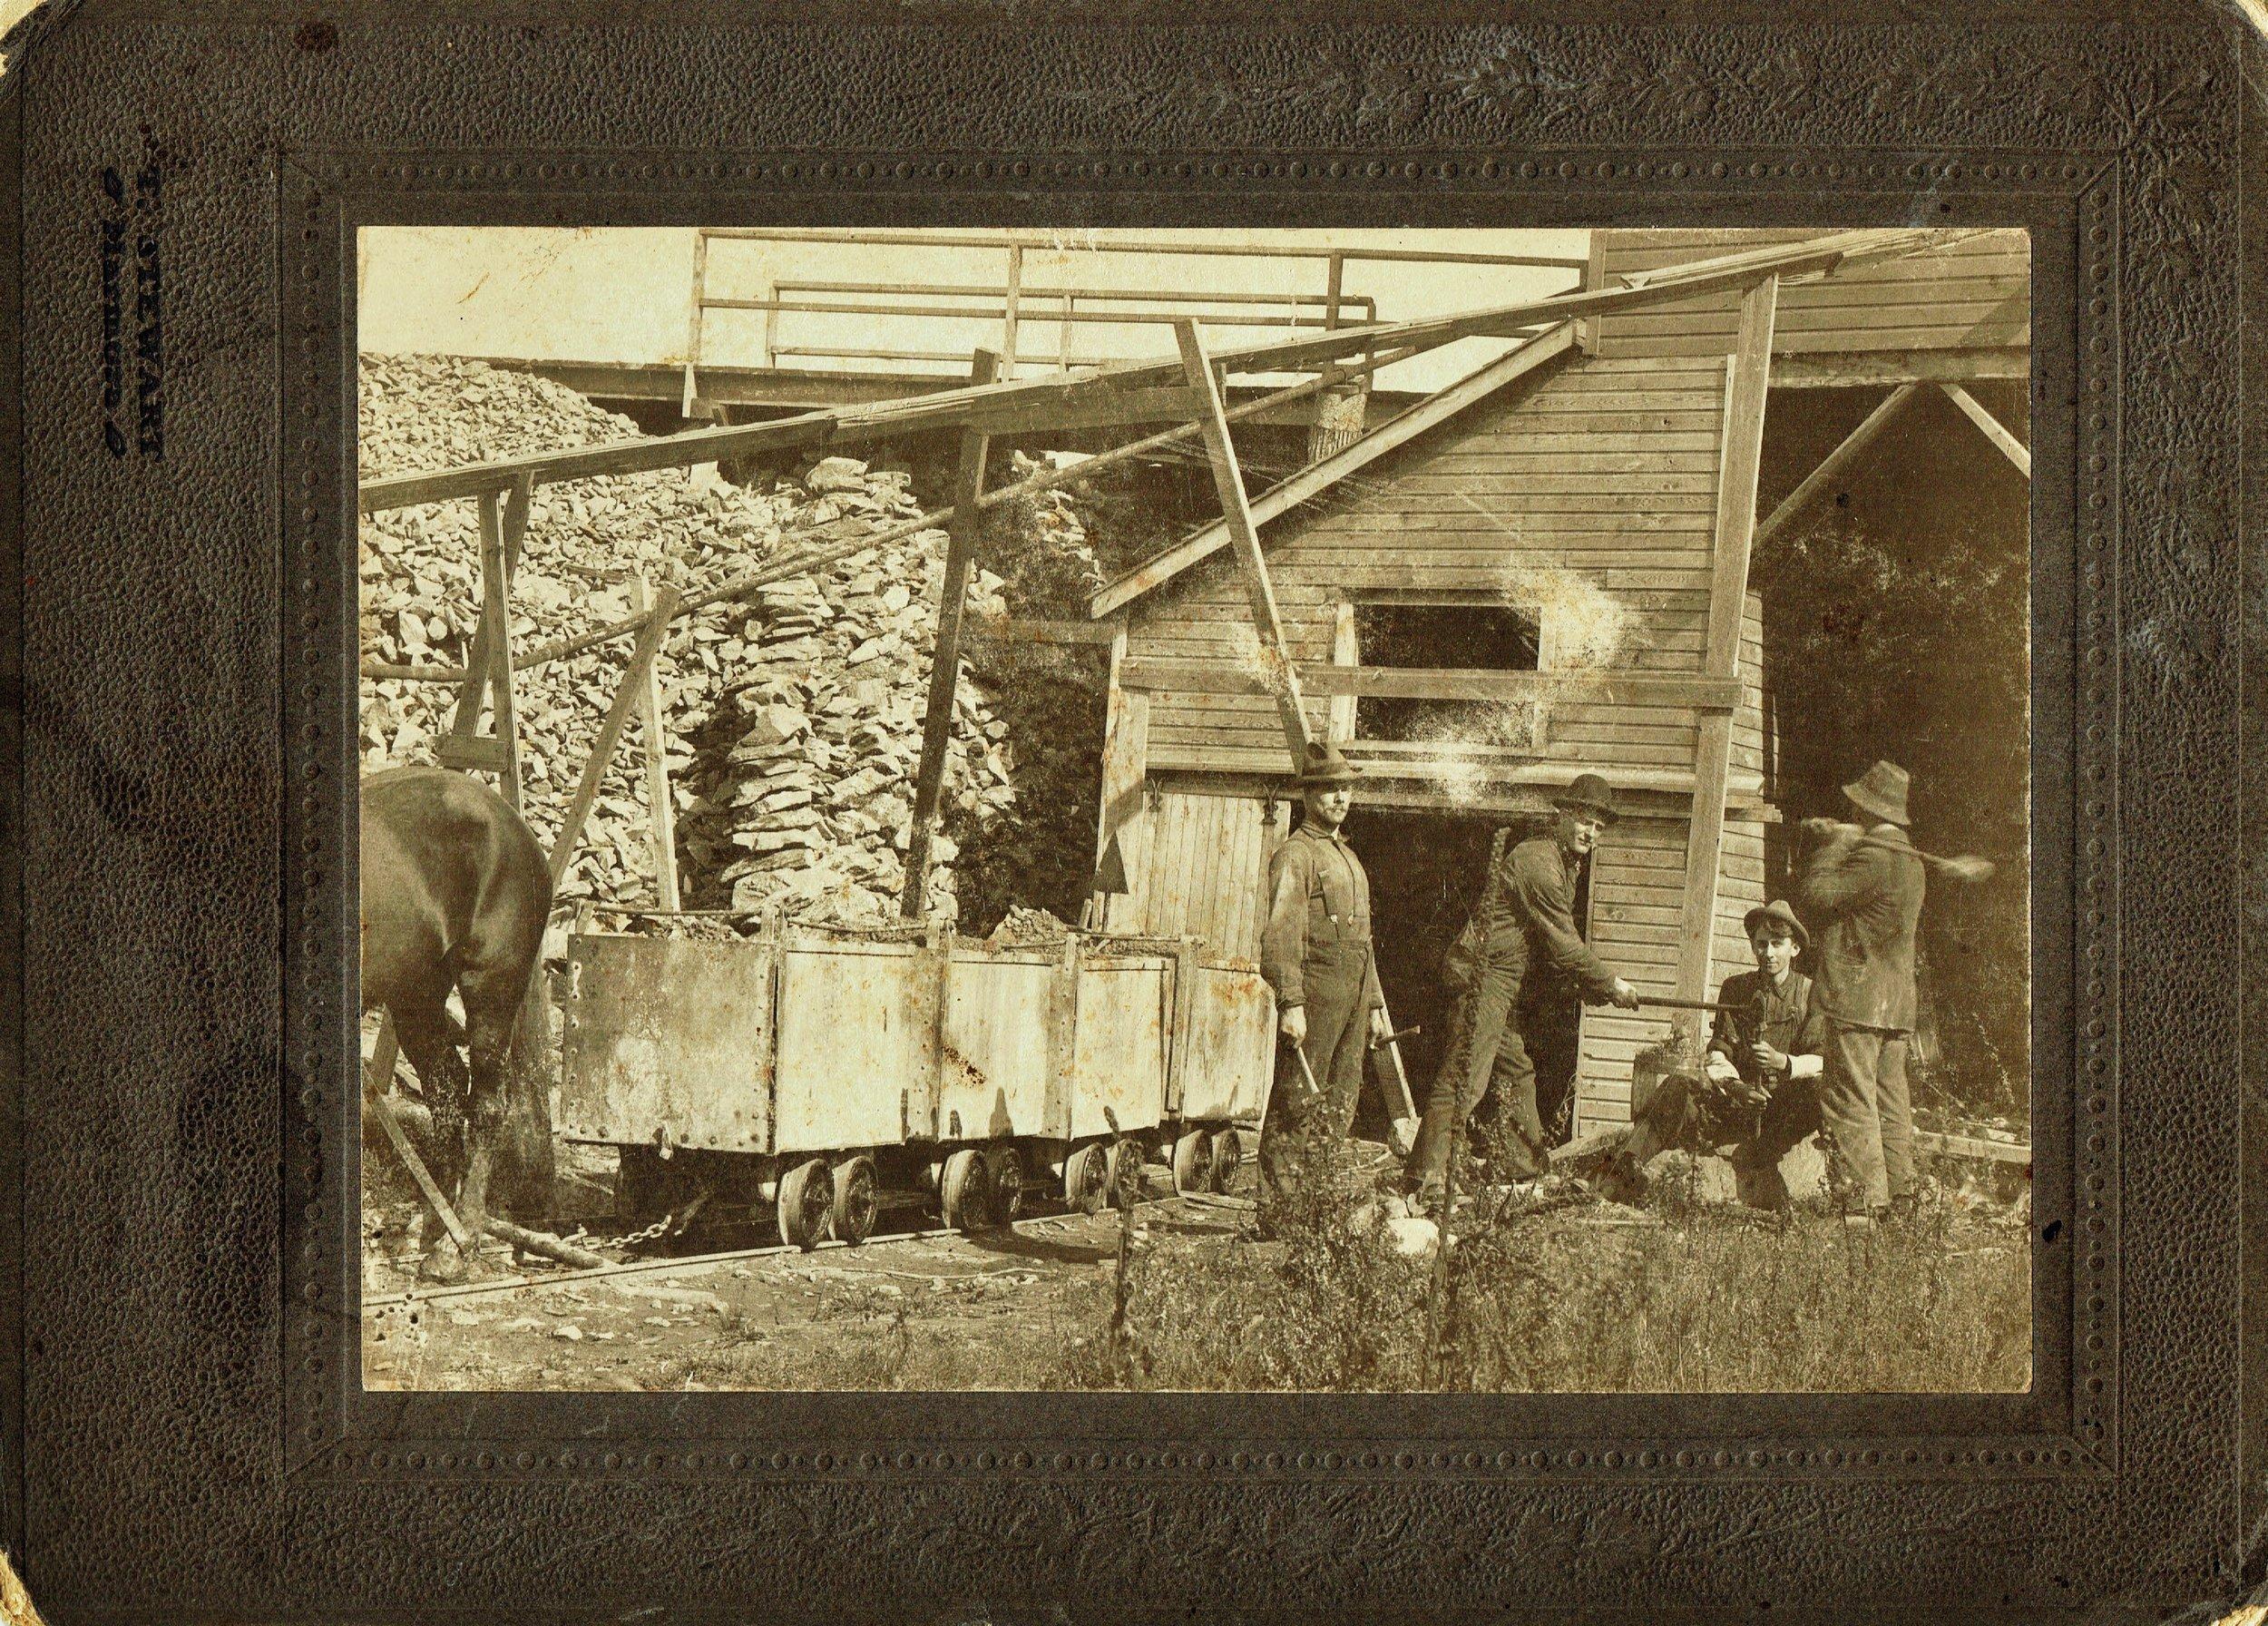 Cordova Mines - George Barrons on left, Howard hamilton next Photographer - Thomas Stewart of Marmora